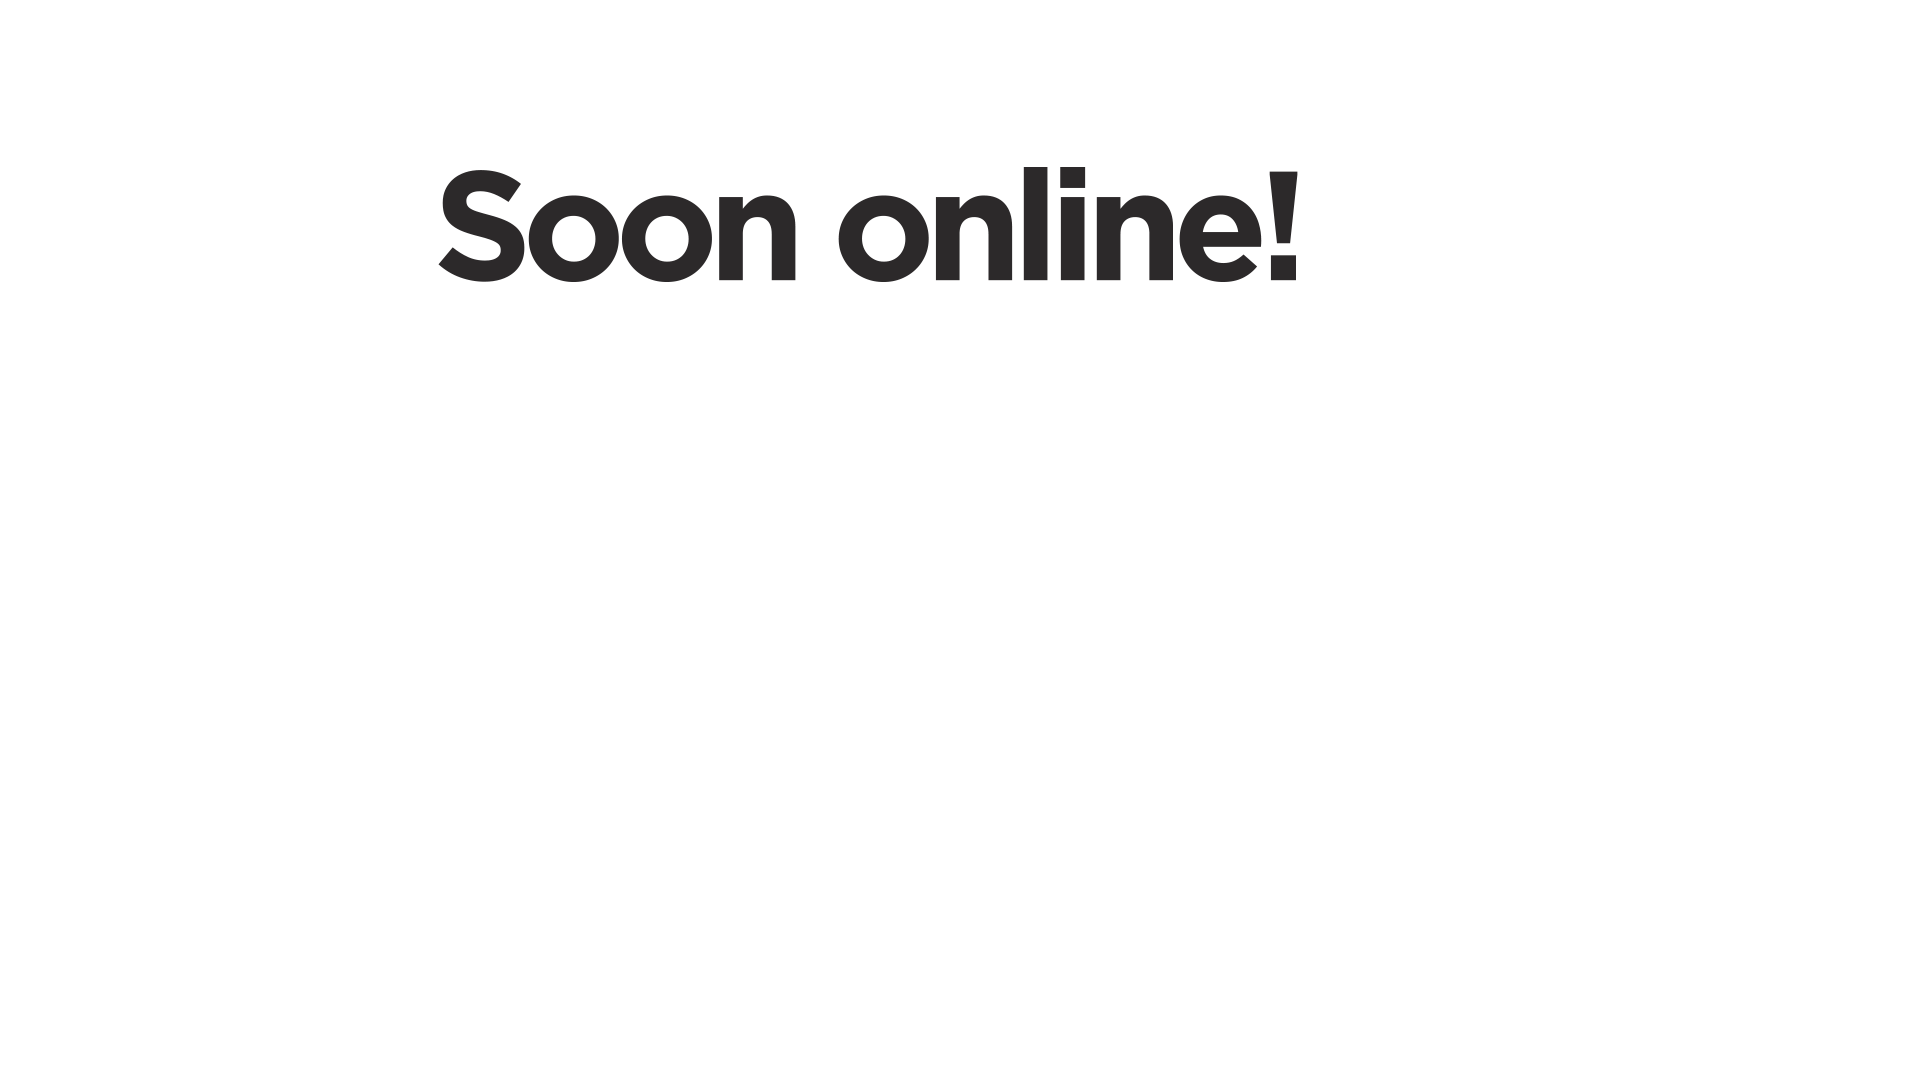 Tas-Development-2021-Design-Landingspagina-001